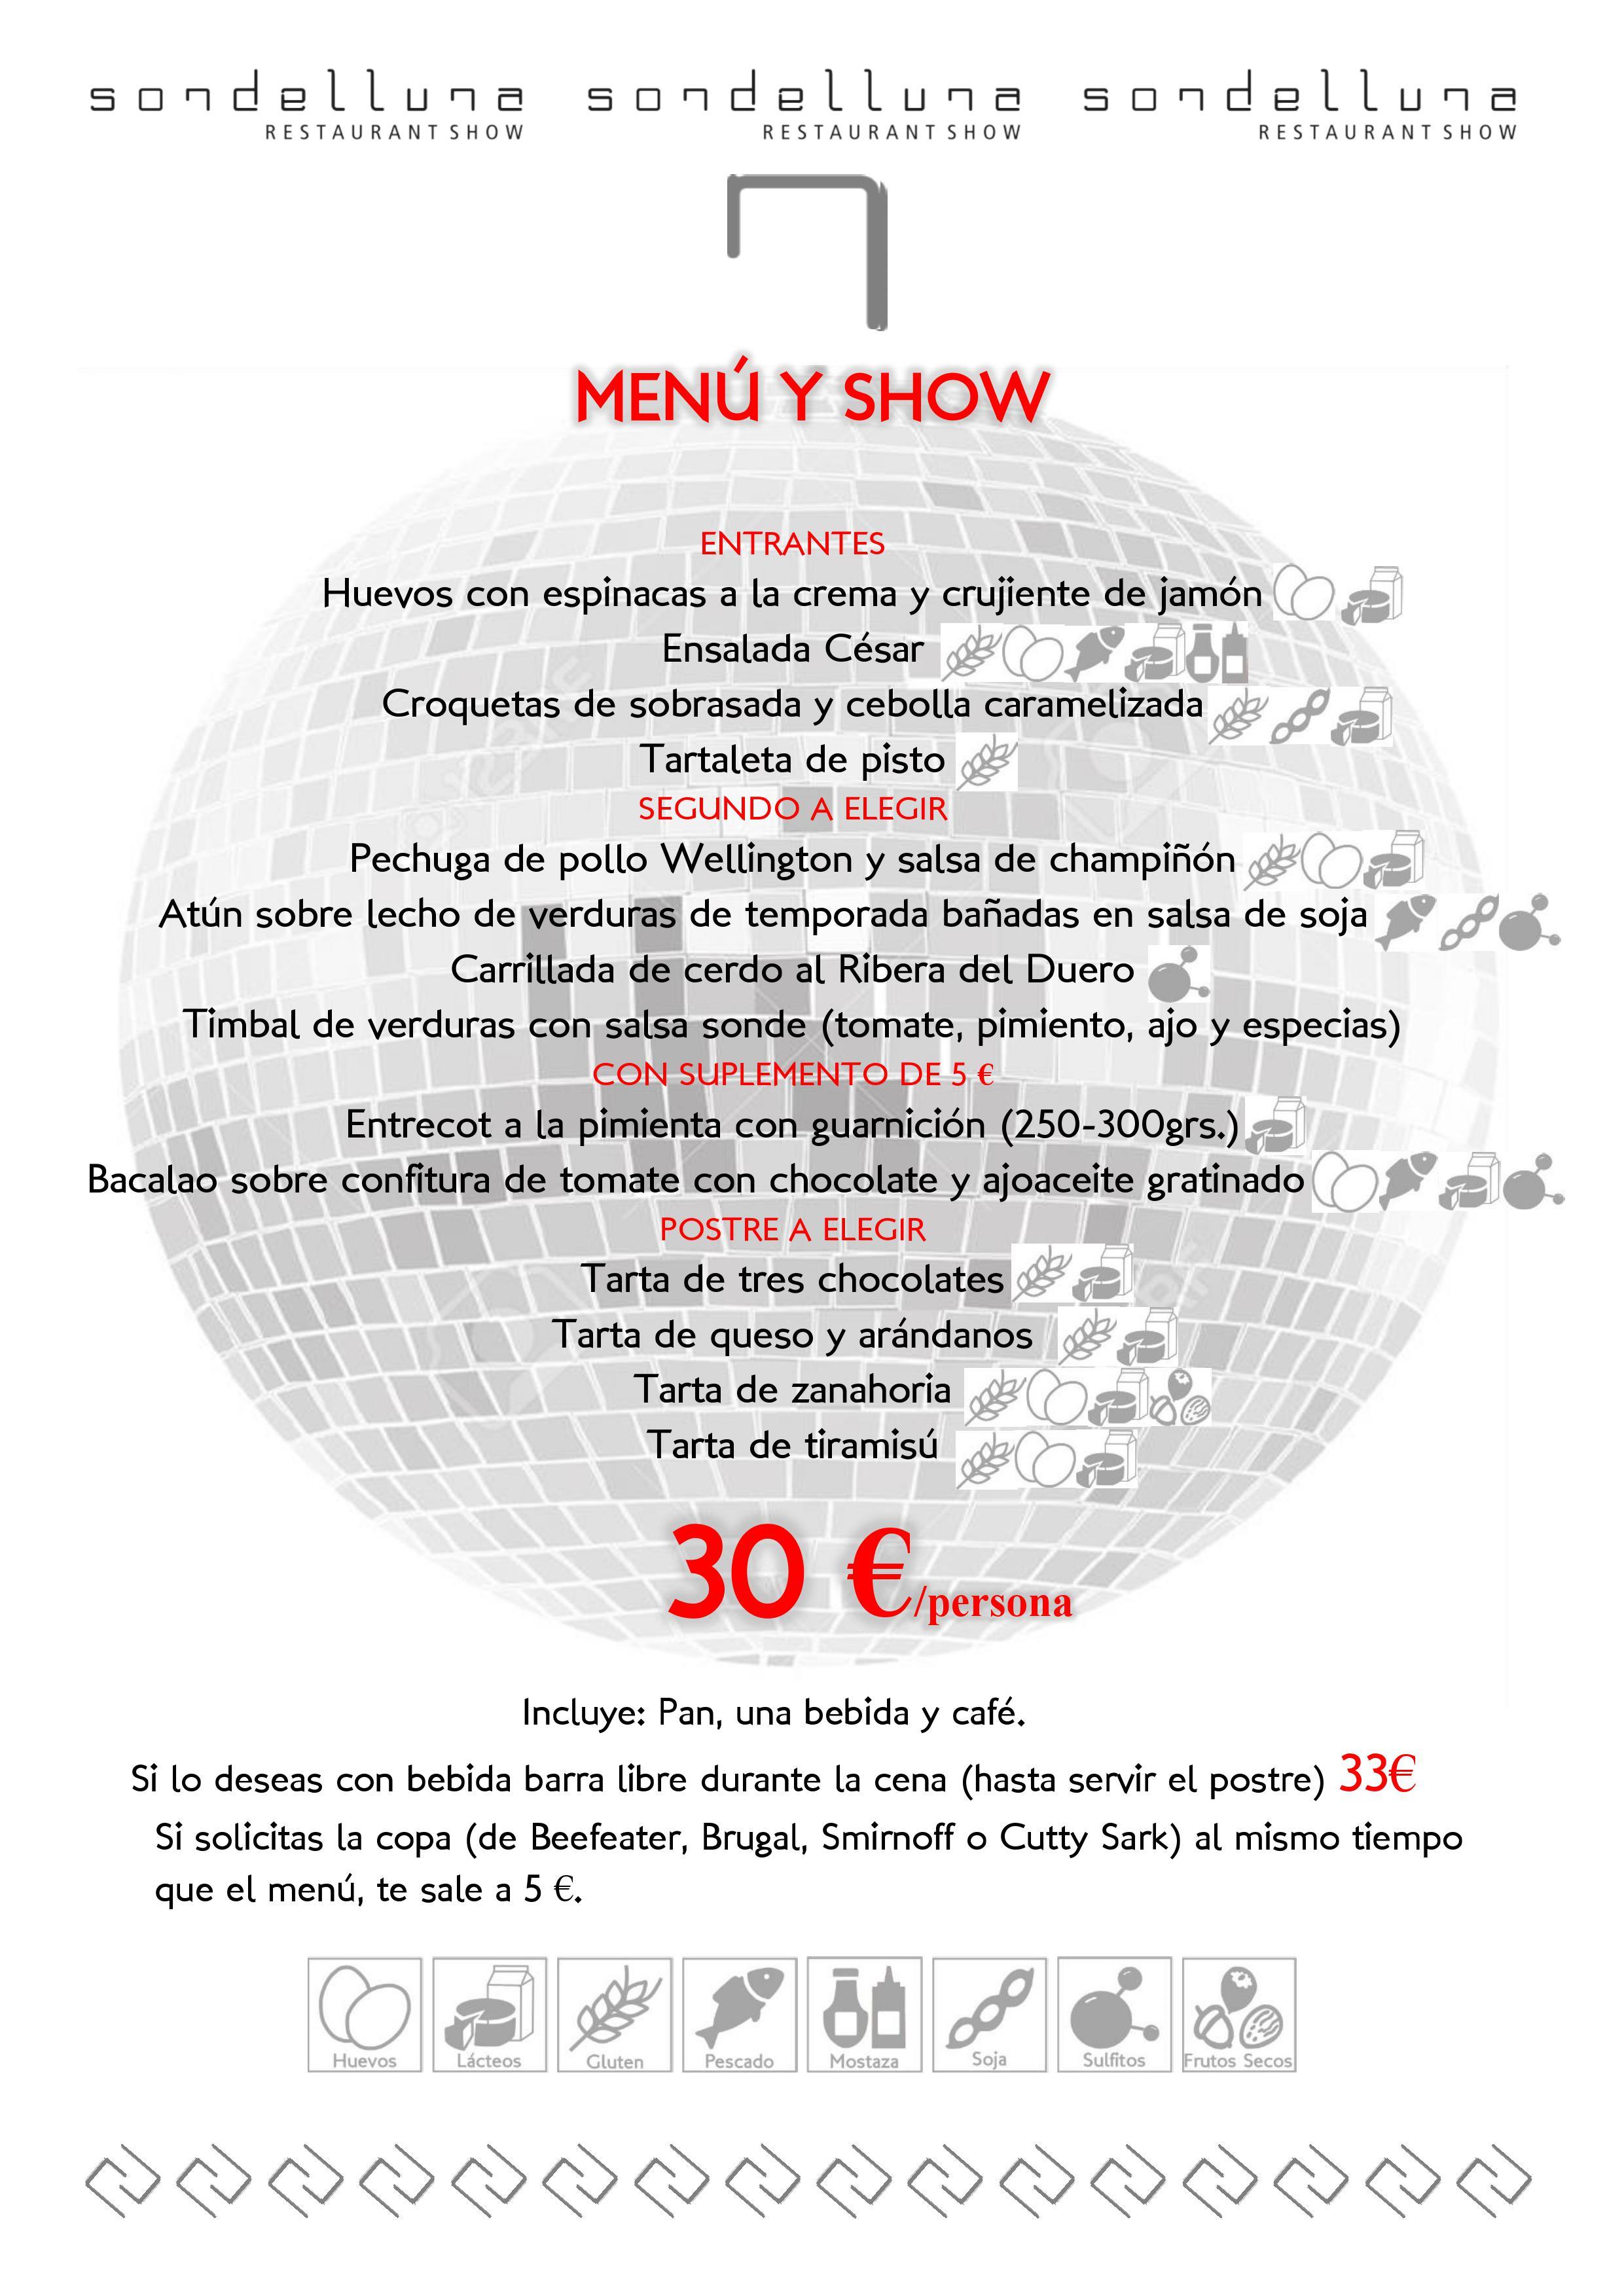 menu show sondelluna